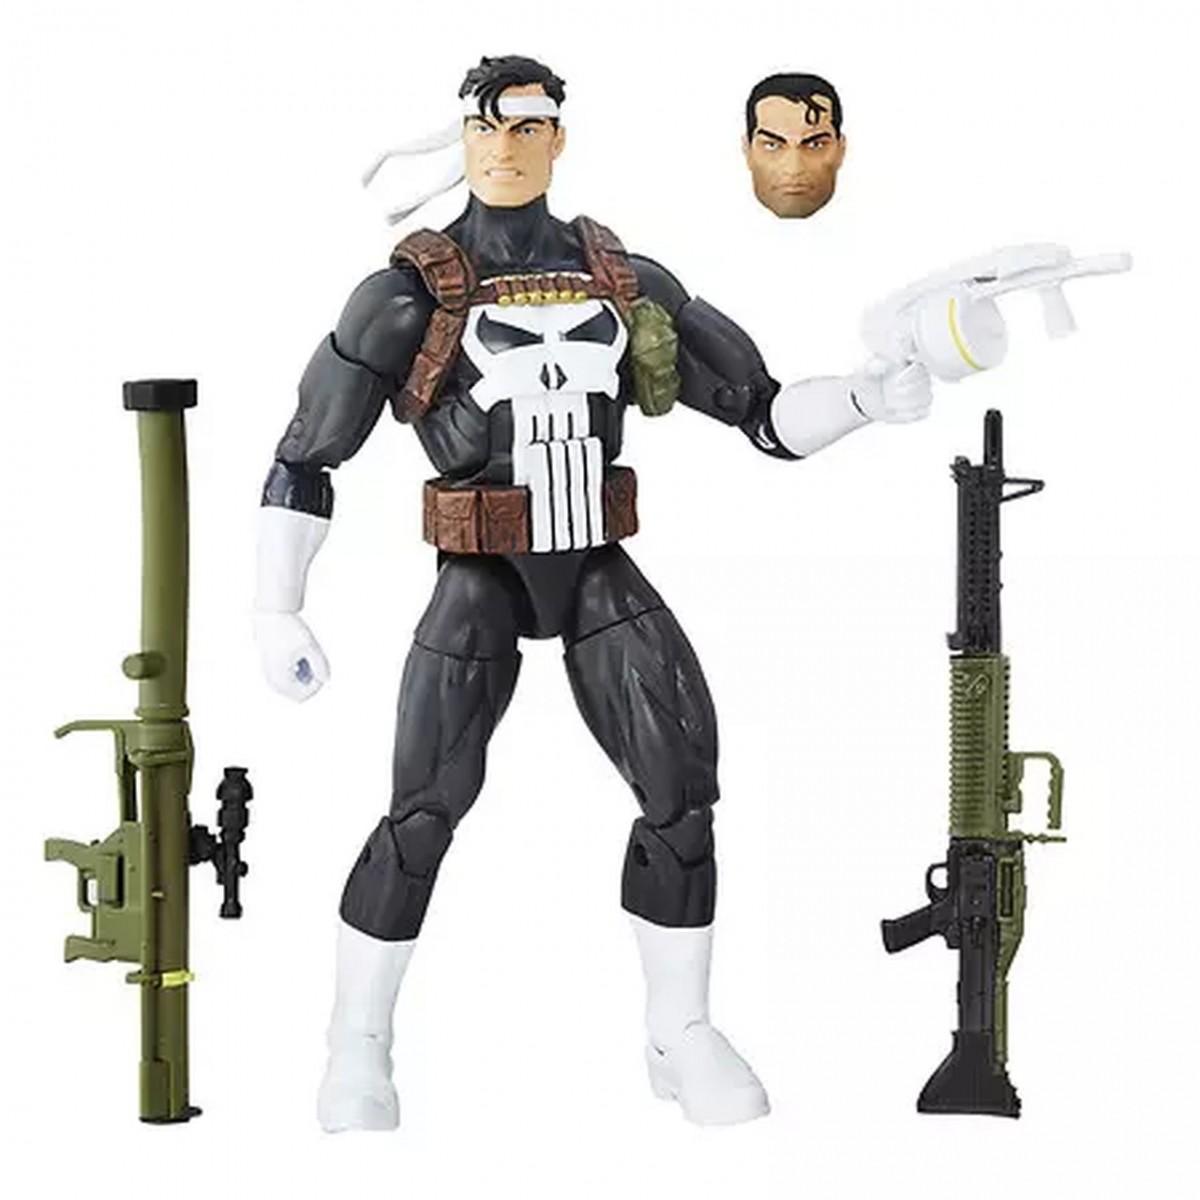 Boneco Justiceiro (The Punisher) Clássico: Marvel Legends - Hasbro